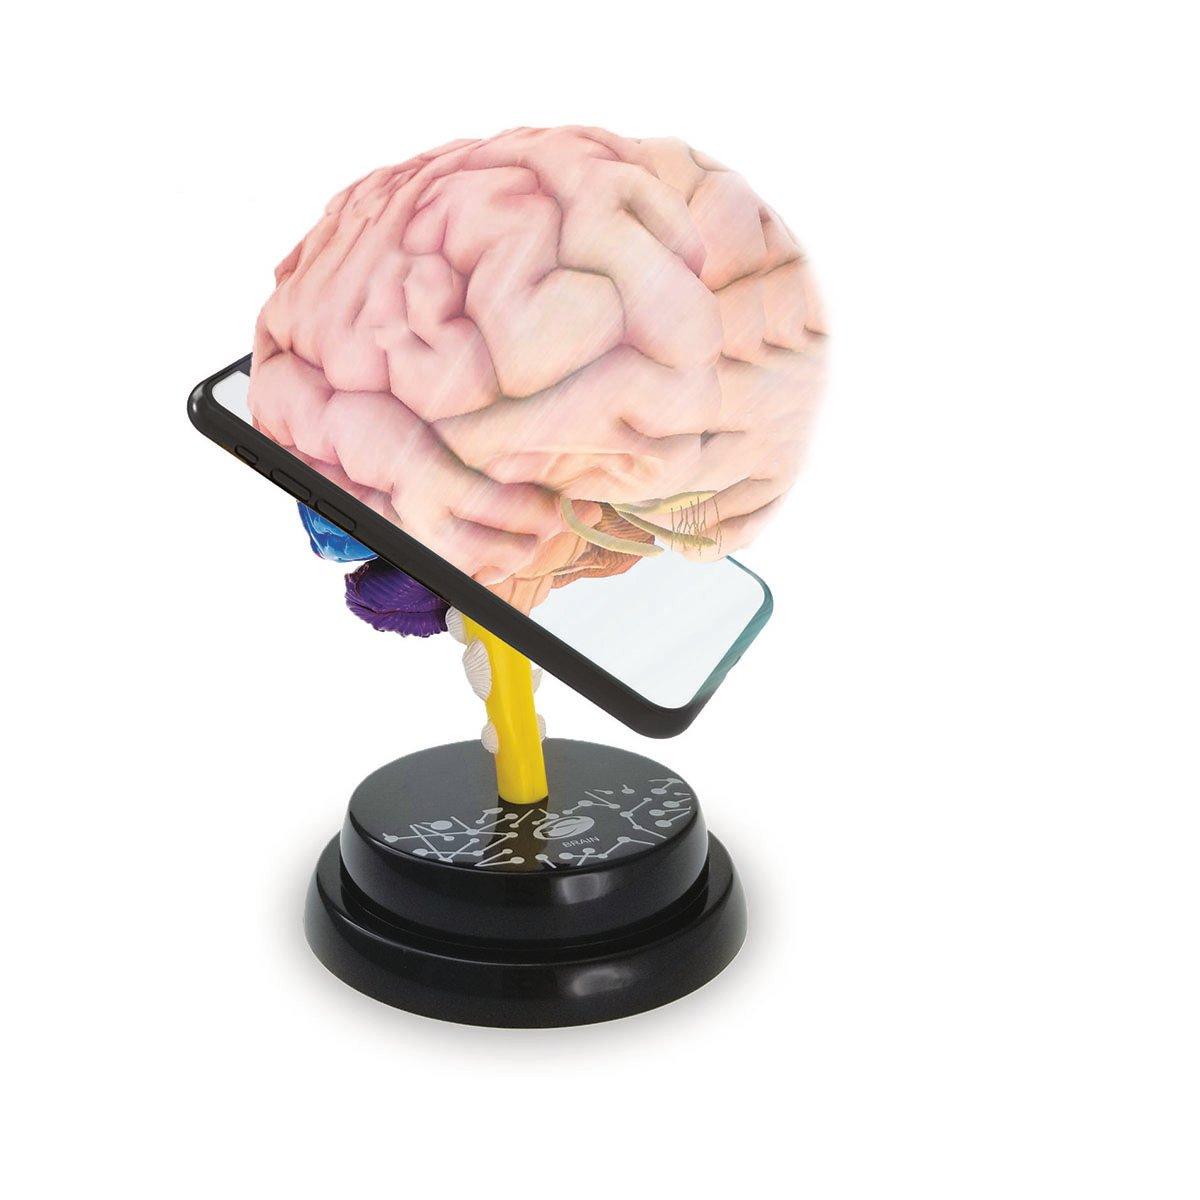 Macheta Anatomica De Asamblat Eastcolight, Creierul